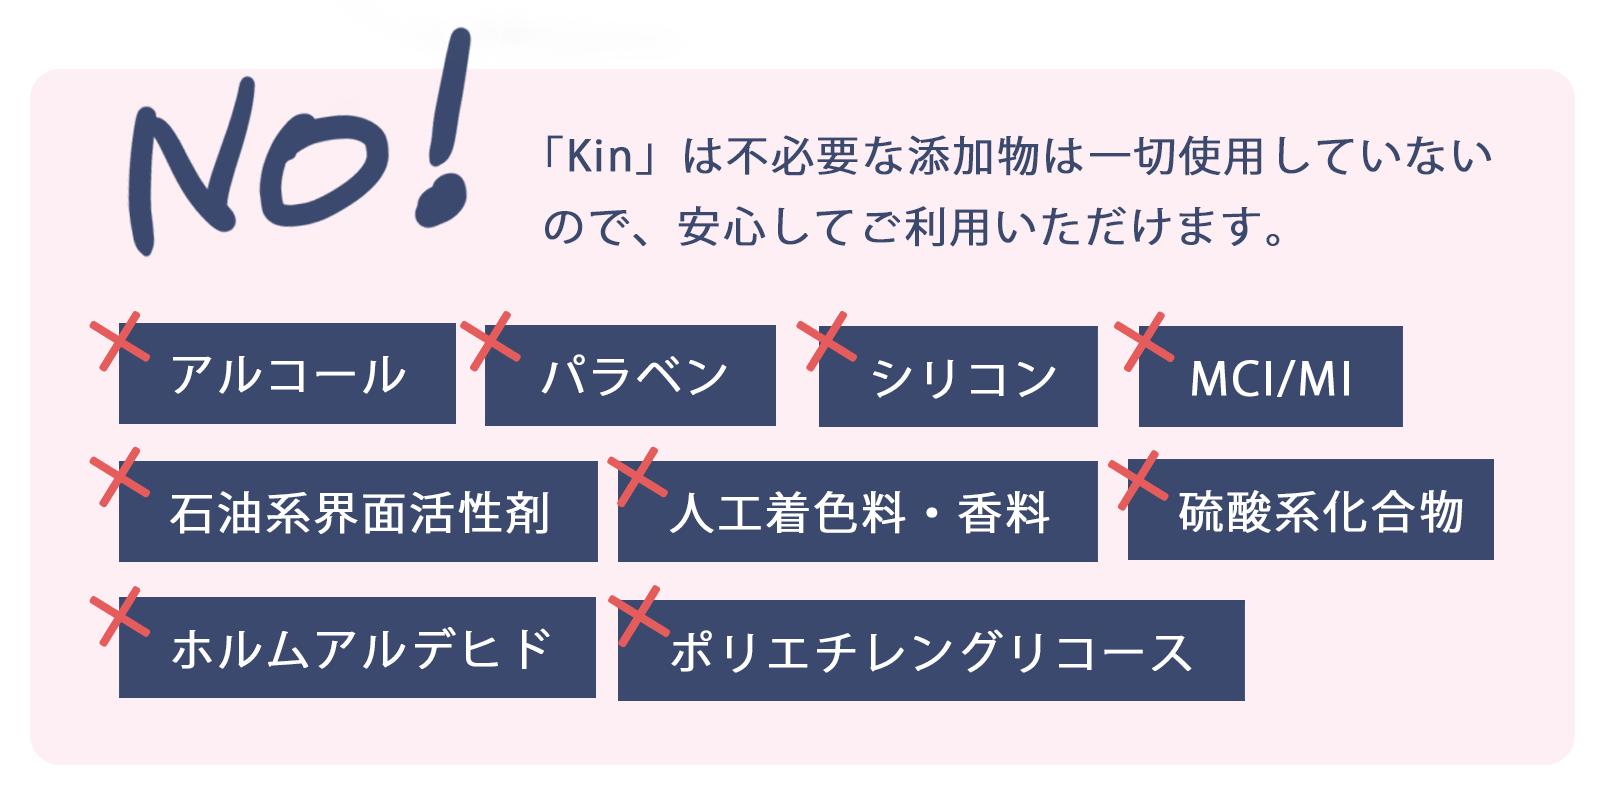 「Kin」は不必要な添加物は一切使用していないので、安心してご利用いただけます。アルコール不使用、パラベン不使用、シリコン不使用、石油系界面活性剤不使用、人工着色料・香料不使用、硫酸系化合物不使用、ホルムアルデヒド不使用、MCI/MI不使用、ポリエチレングリコース不使用。